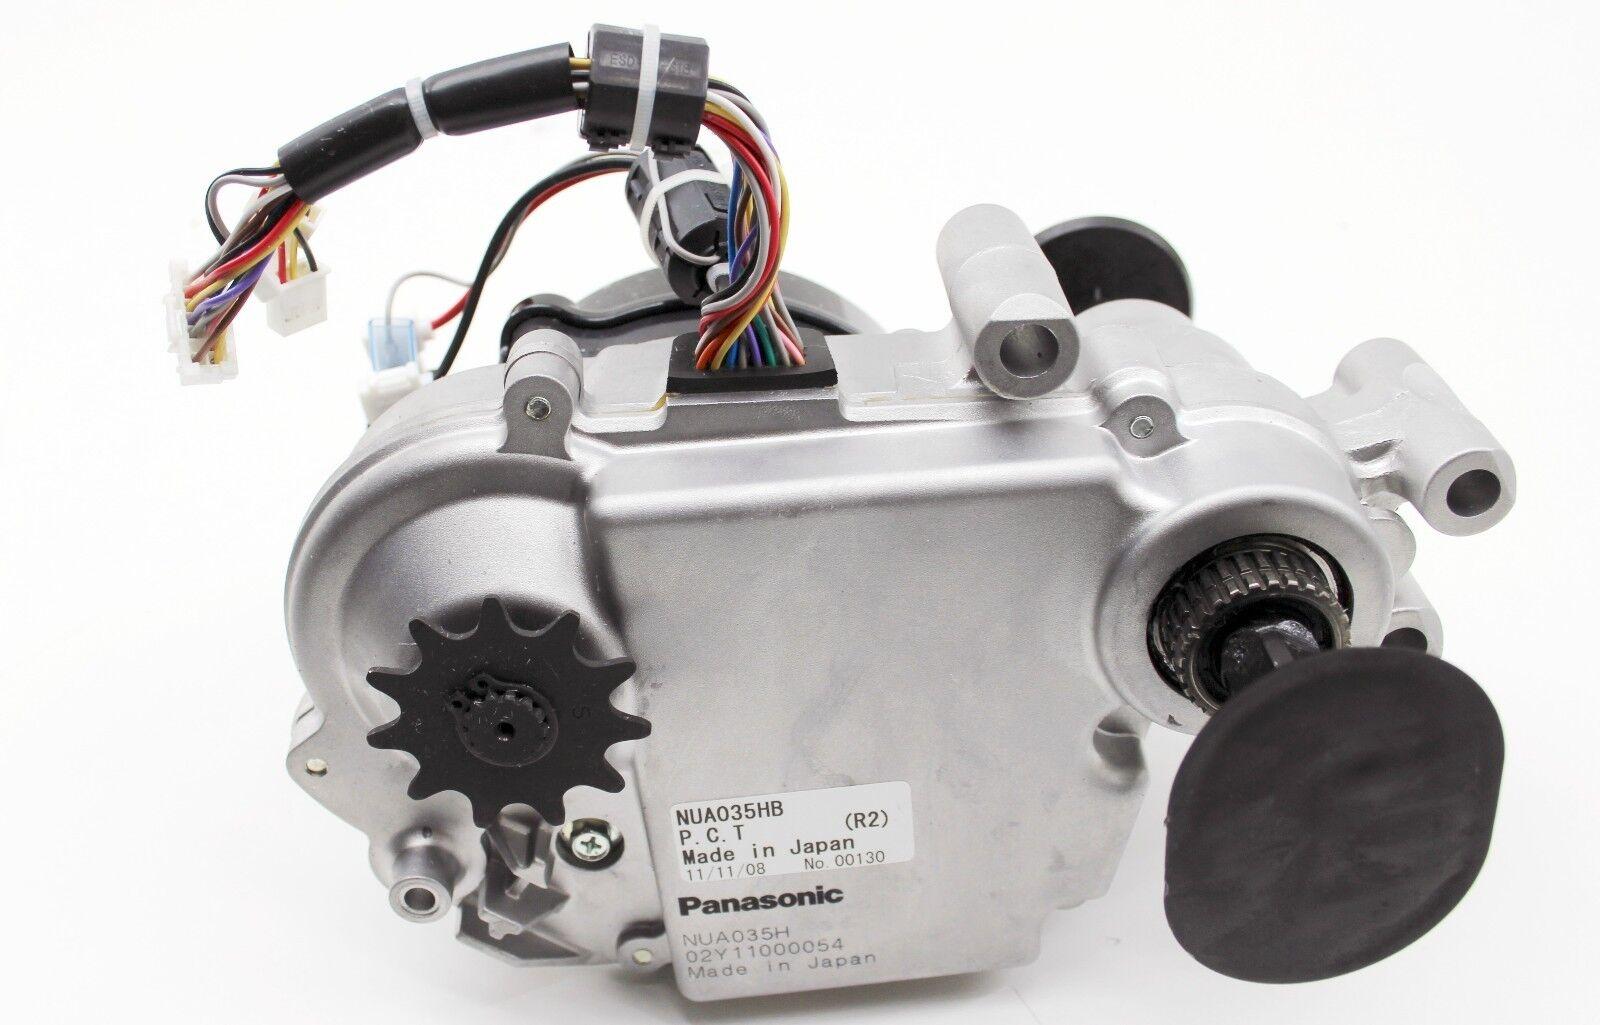 Panasonic Electric  Motor for 45 km   H E-Bike Speed Panasonic NUA035HB, R2  more affordable